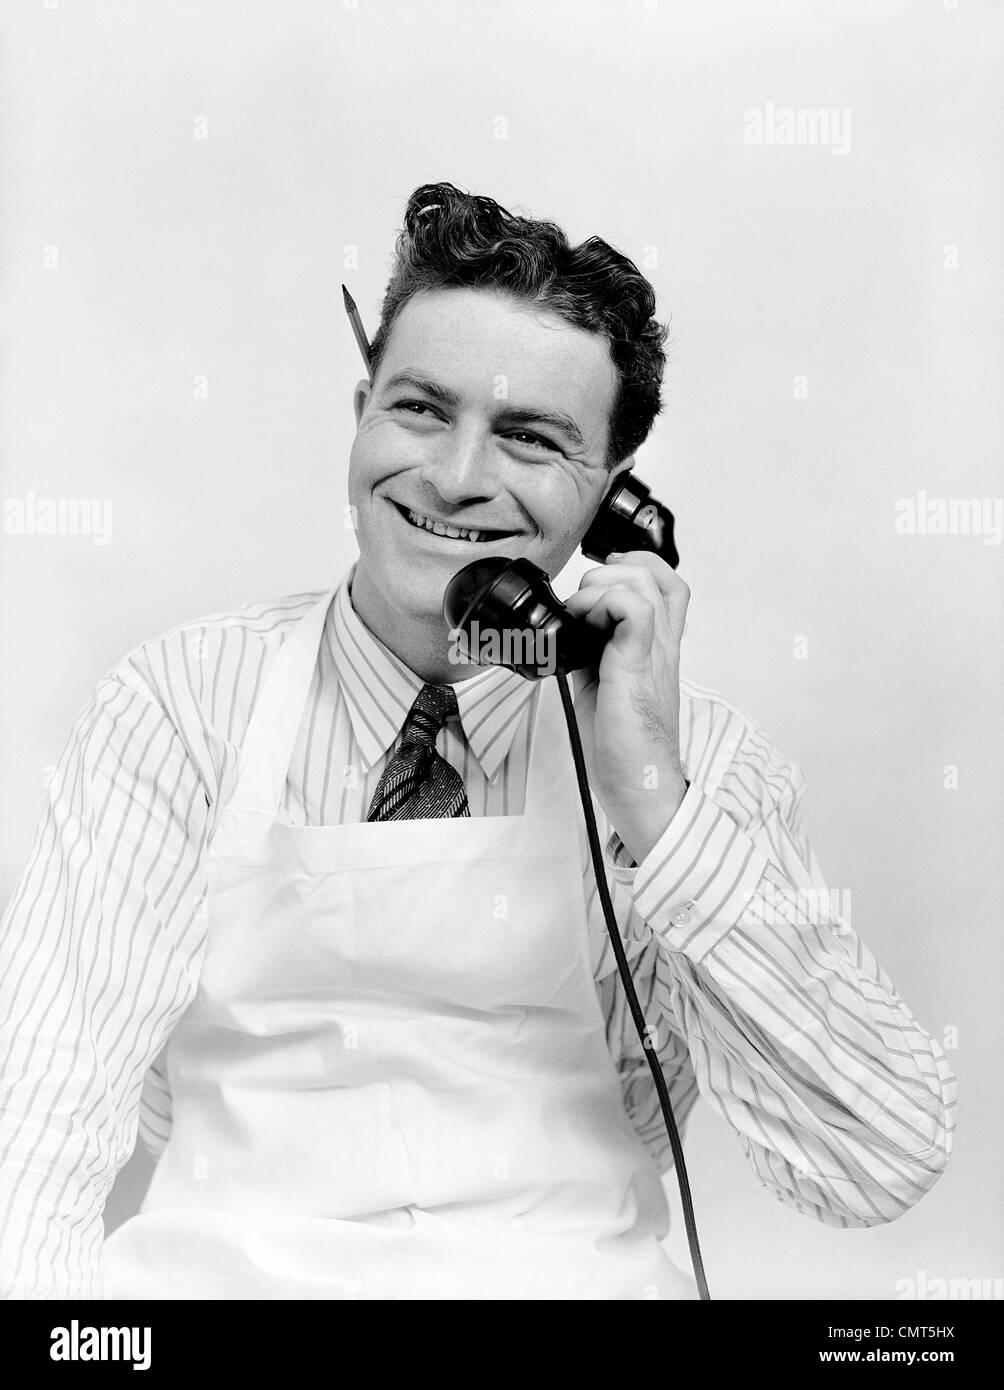 1930ER JAHRE PORTRAIT LÄCHELND MANN SCHREIBER TRÄGT SCHÜRZE GESPRÄCH AM TELEFON BLEISTIFT HINTER Stockbild